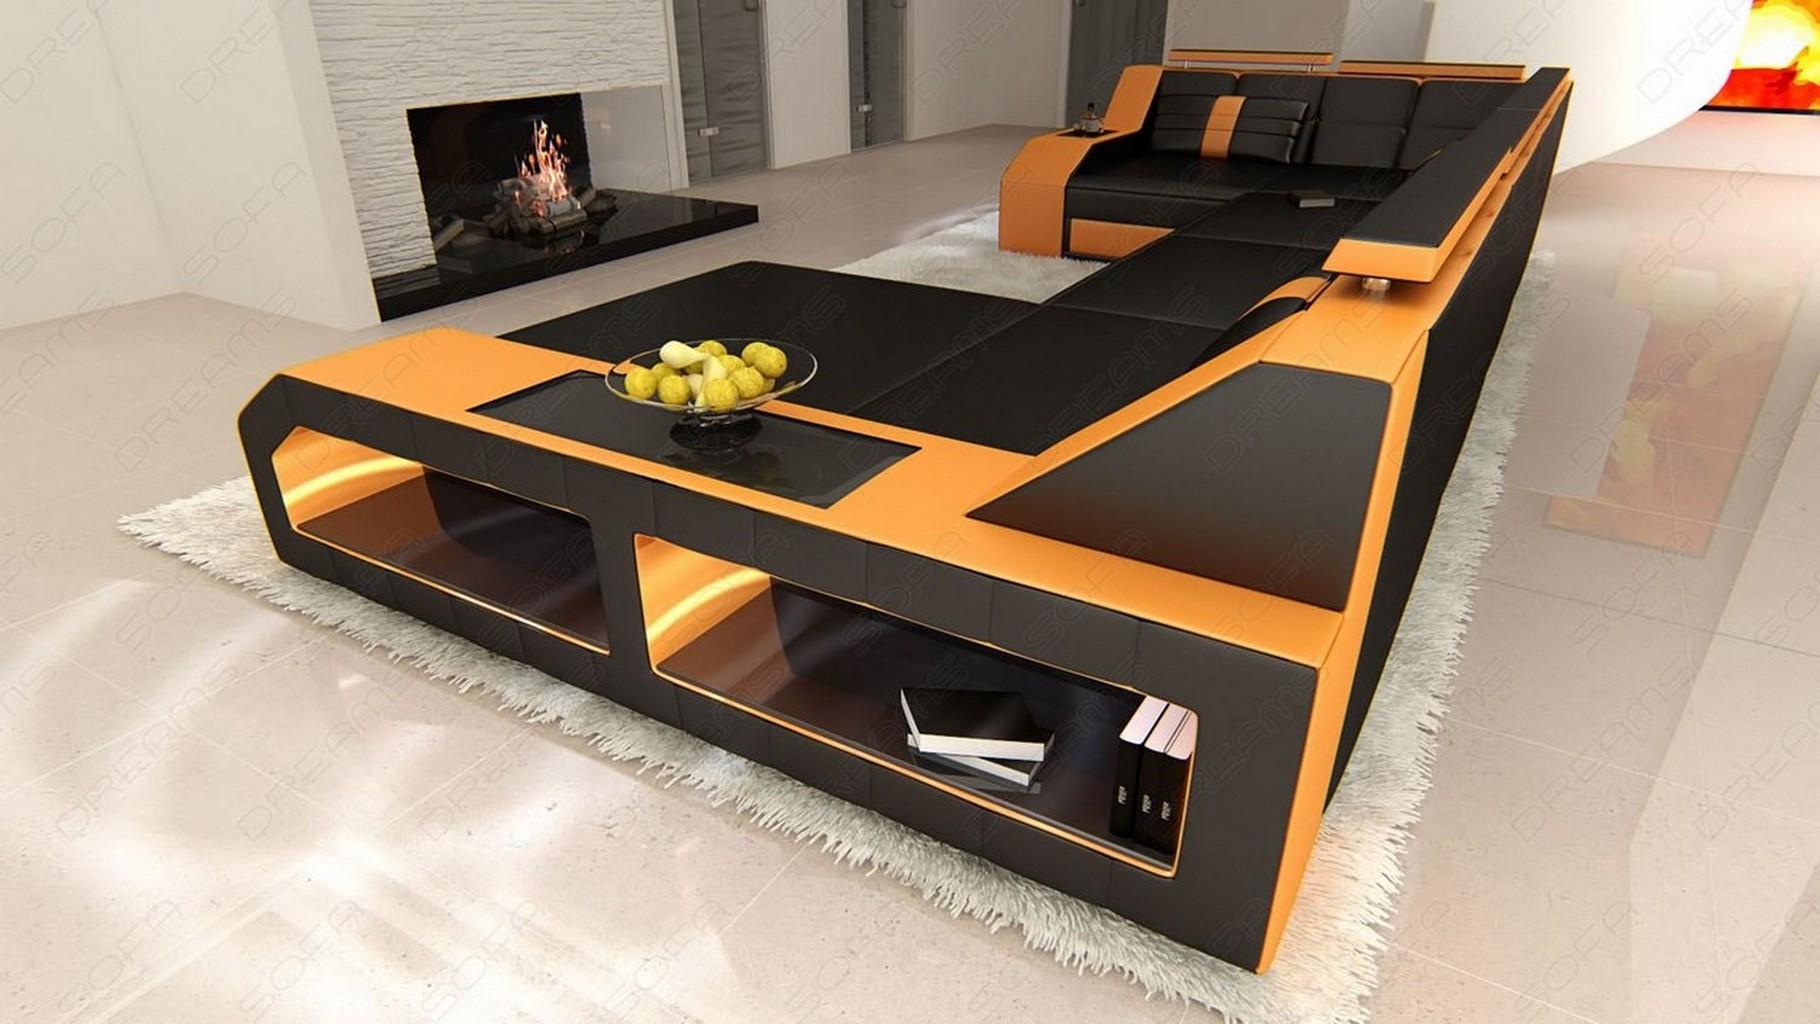 design sectional sofa arezzo led black orange ebay. Black Bedroom Furniture Sets. Home Design Ideas